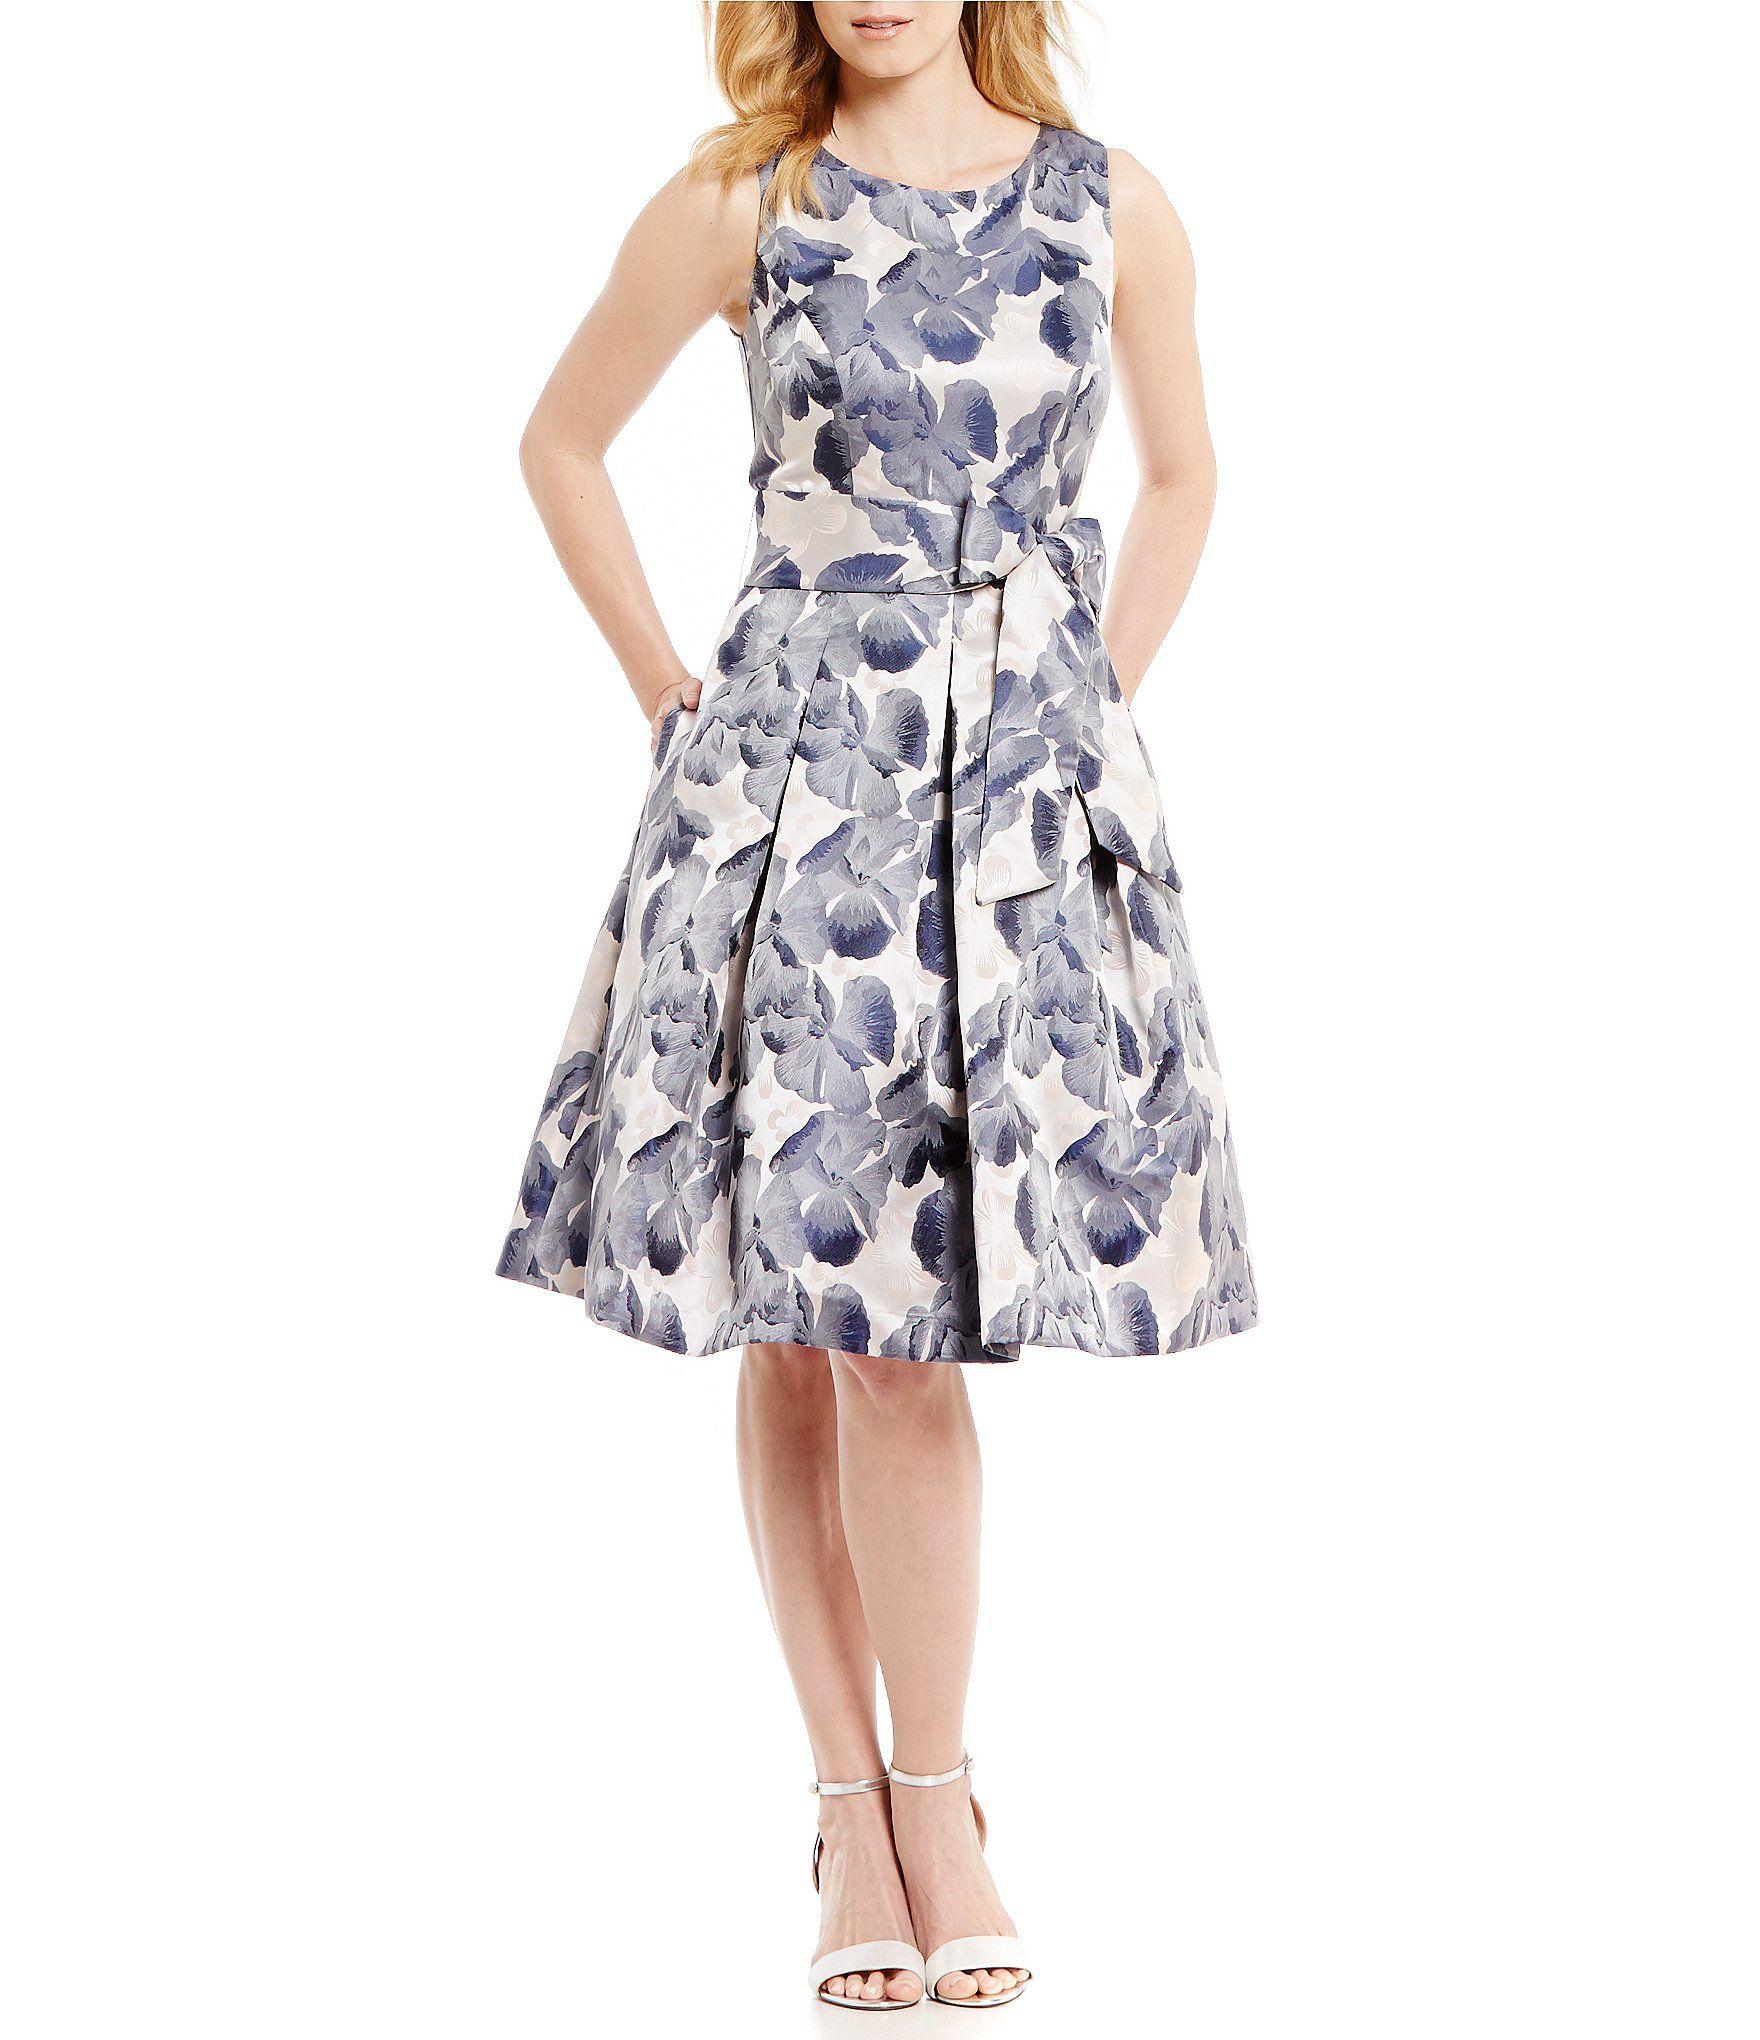 Wedding dresses dillards  Jessica Howard Belted FloralPrint Party Dress  Dillards Clothing